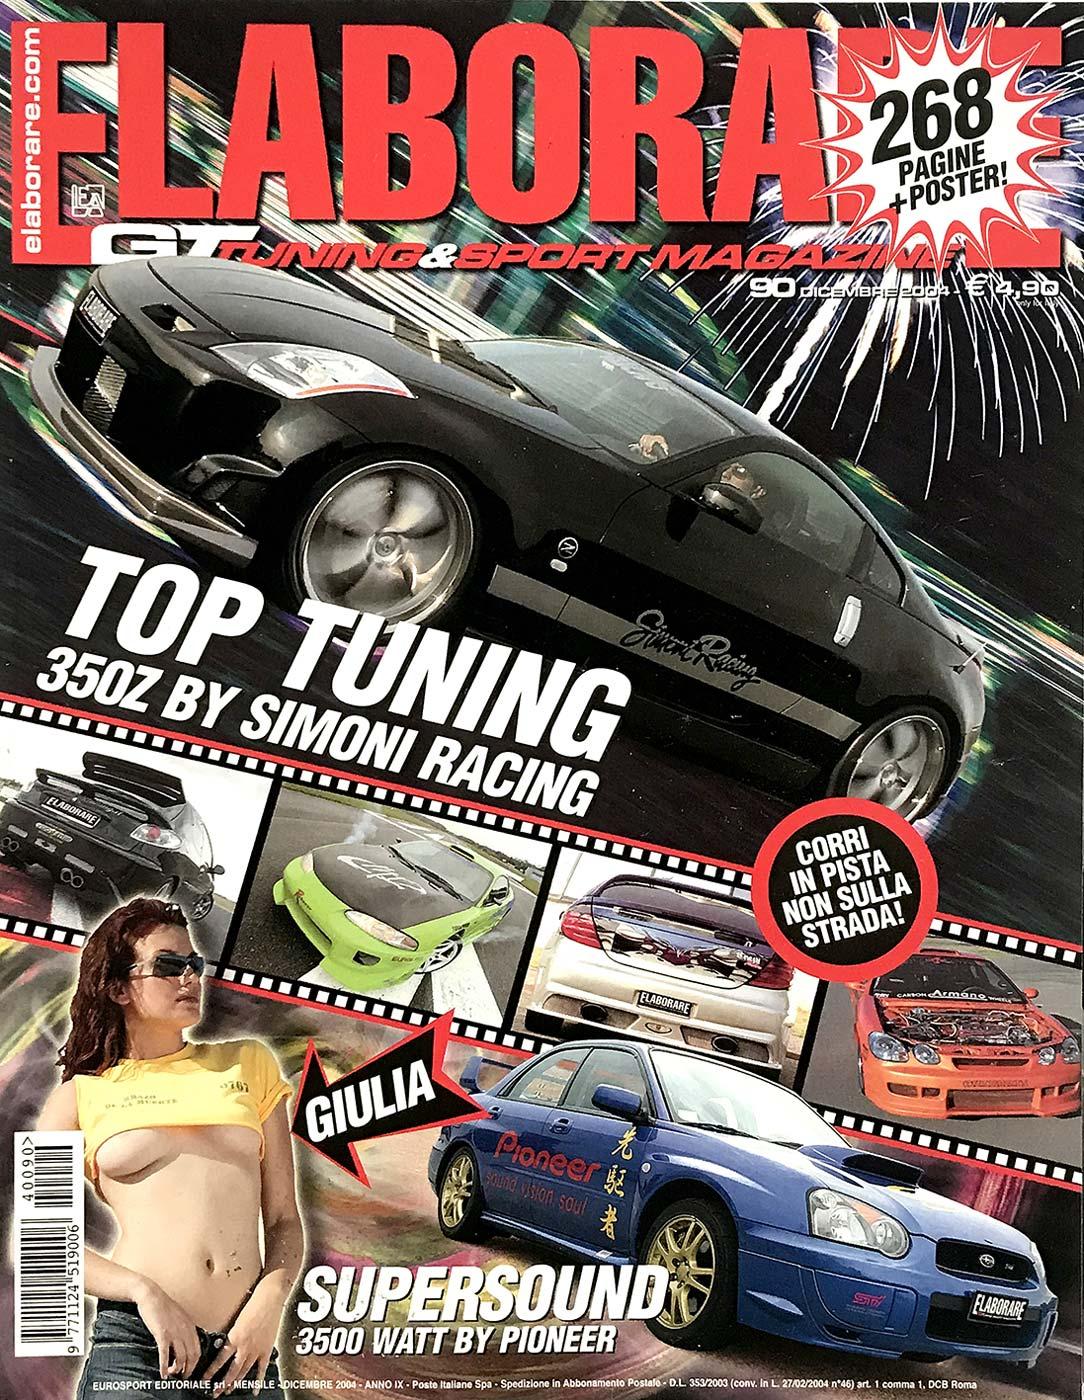 Elaborare n° 90 Dicembre 2004